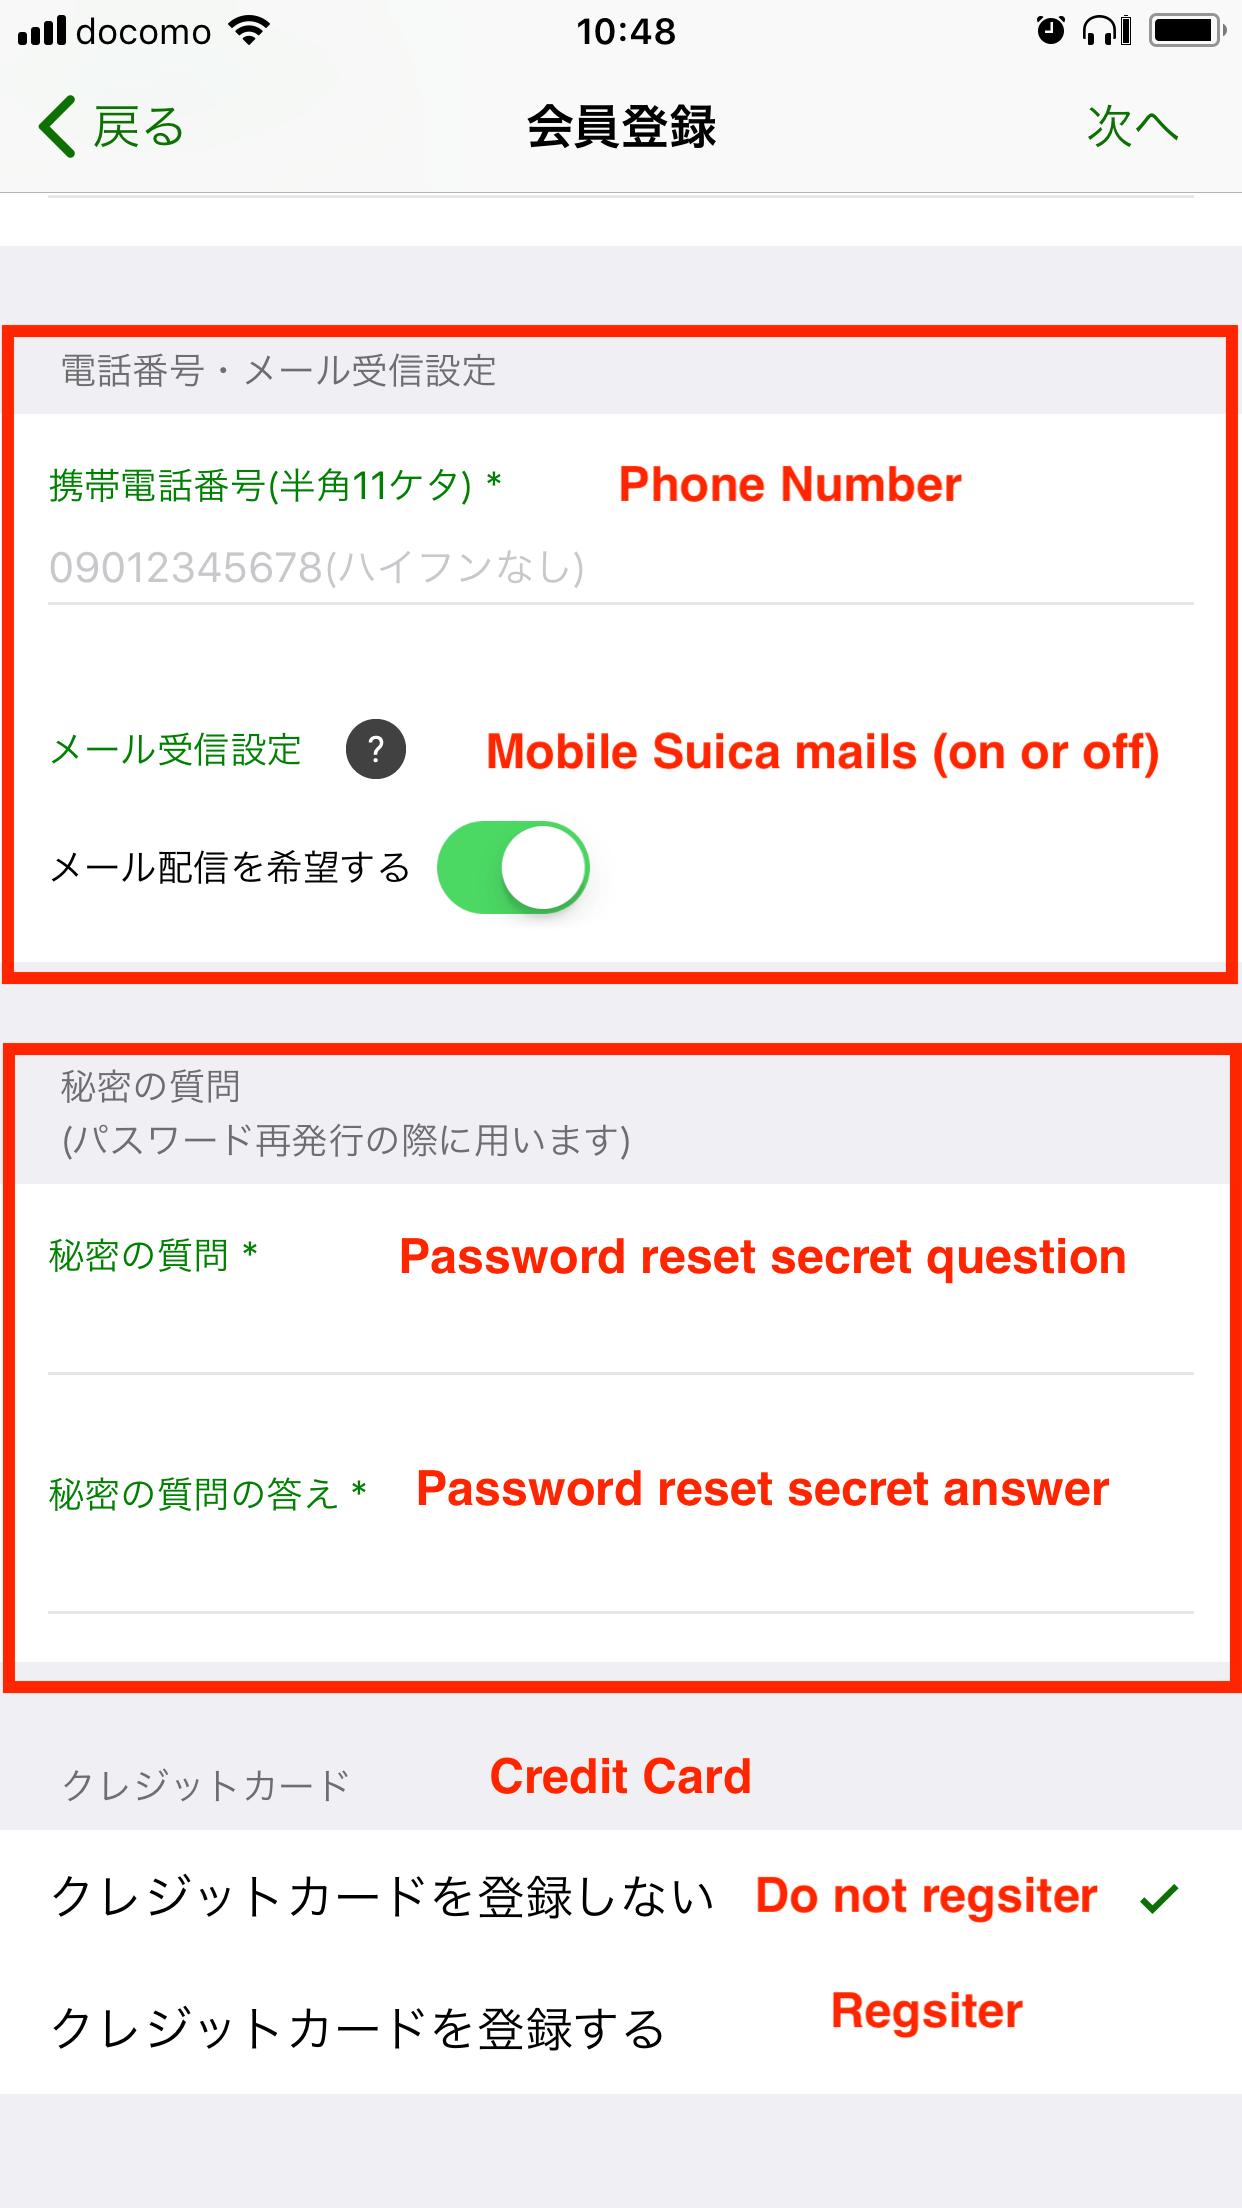 MS registration 6